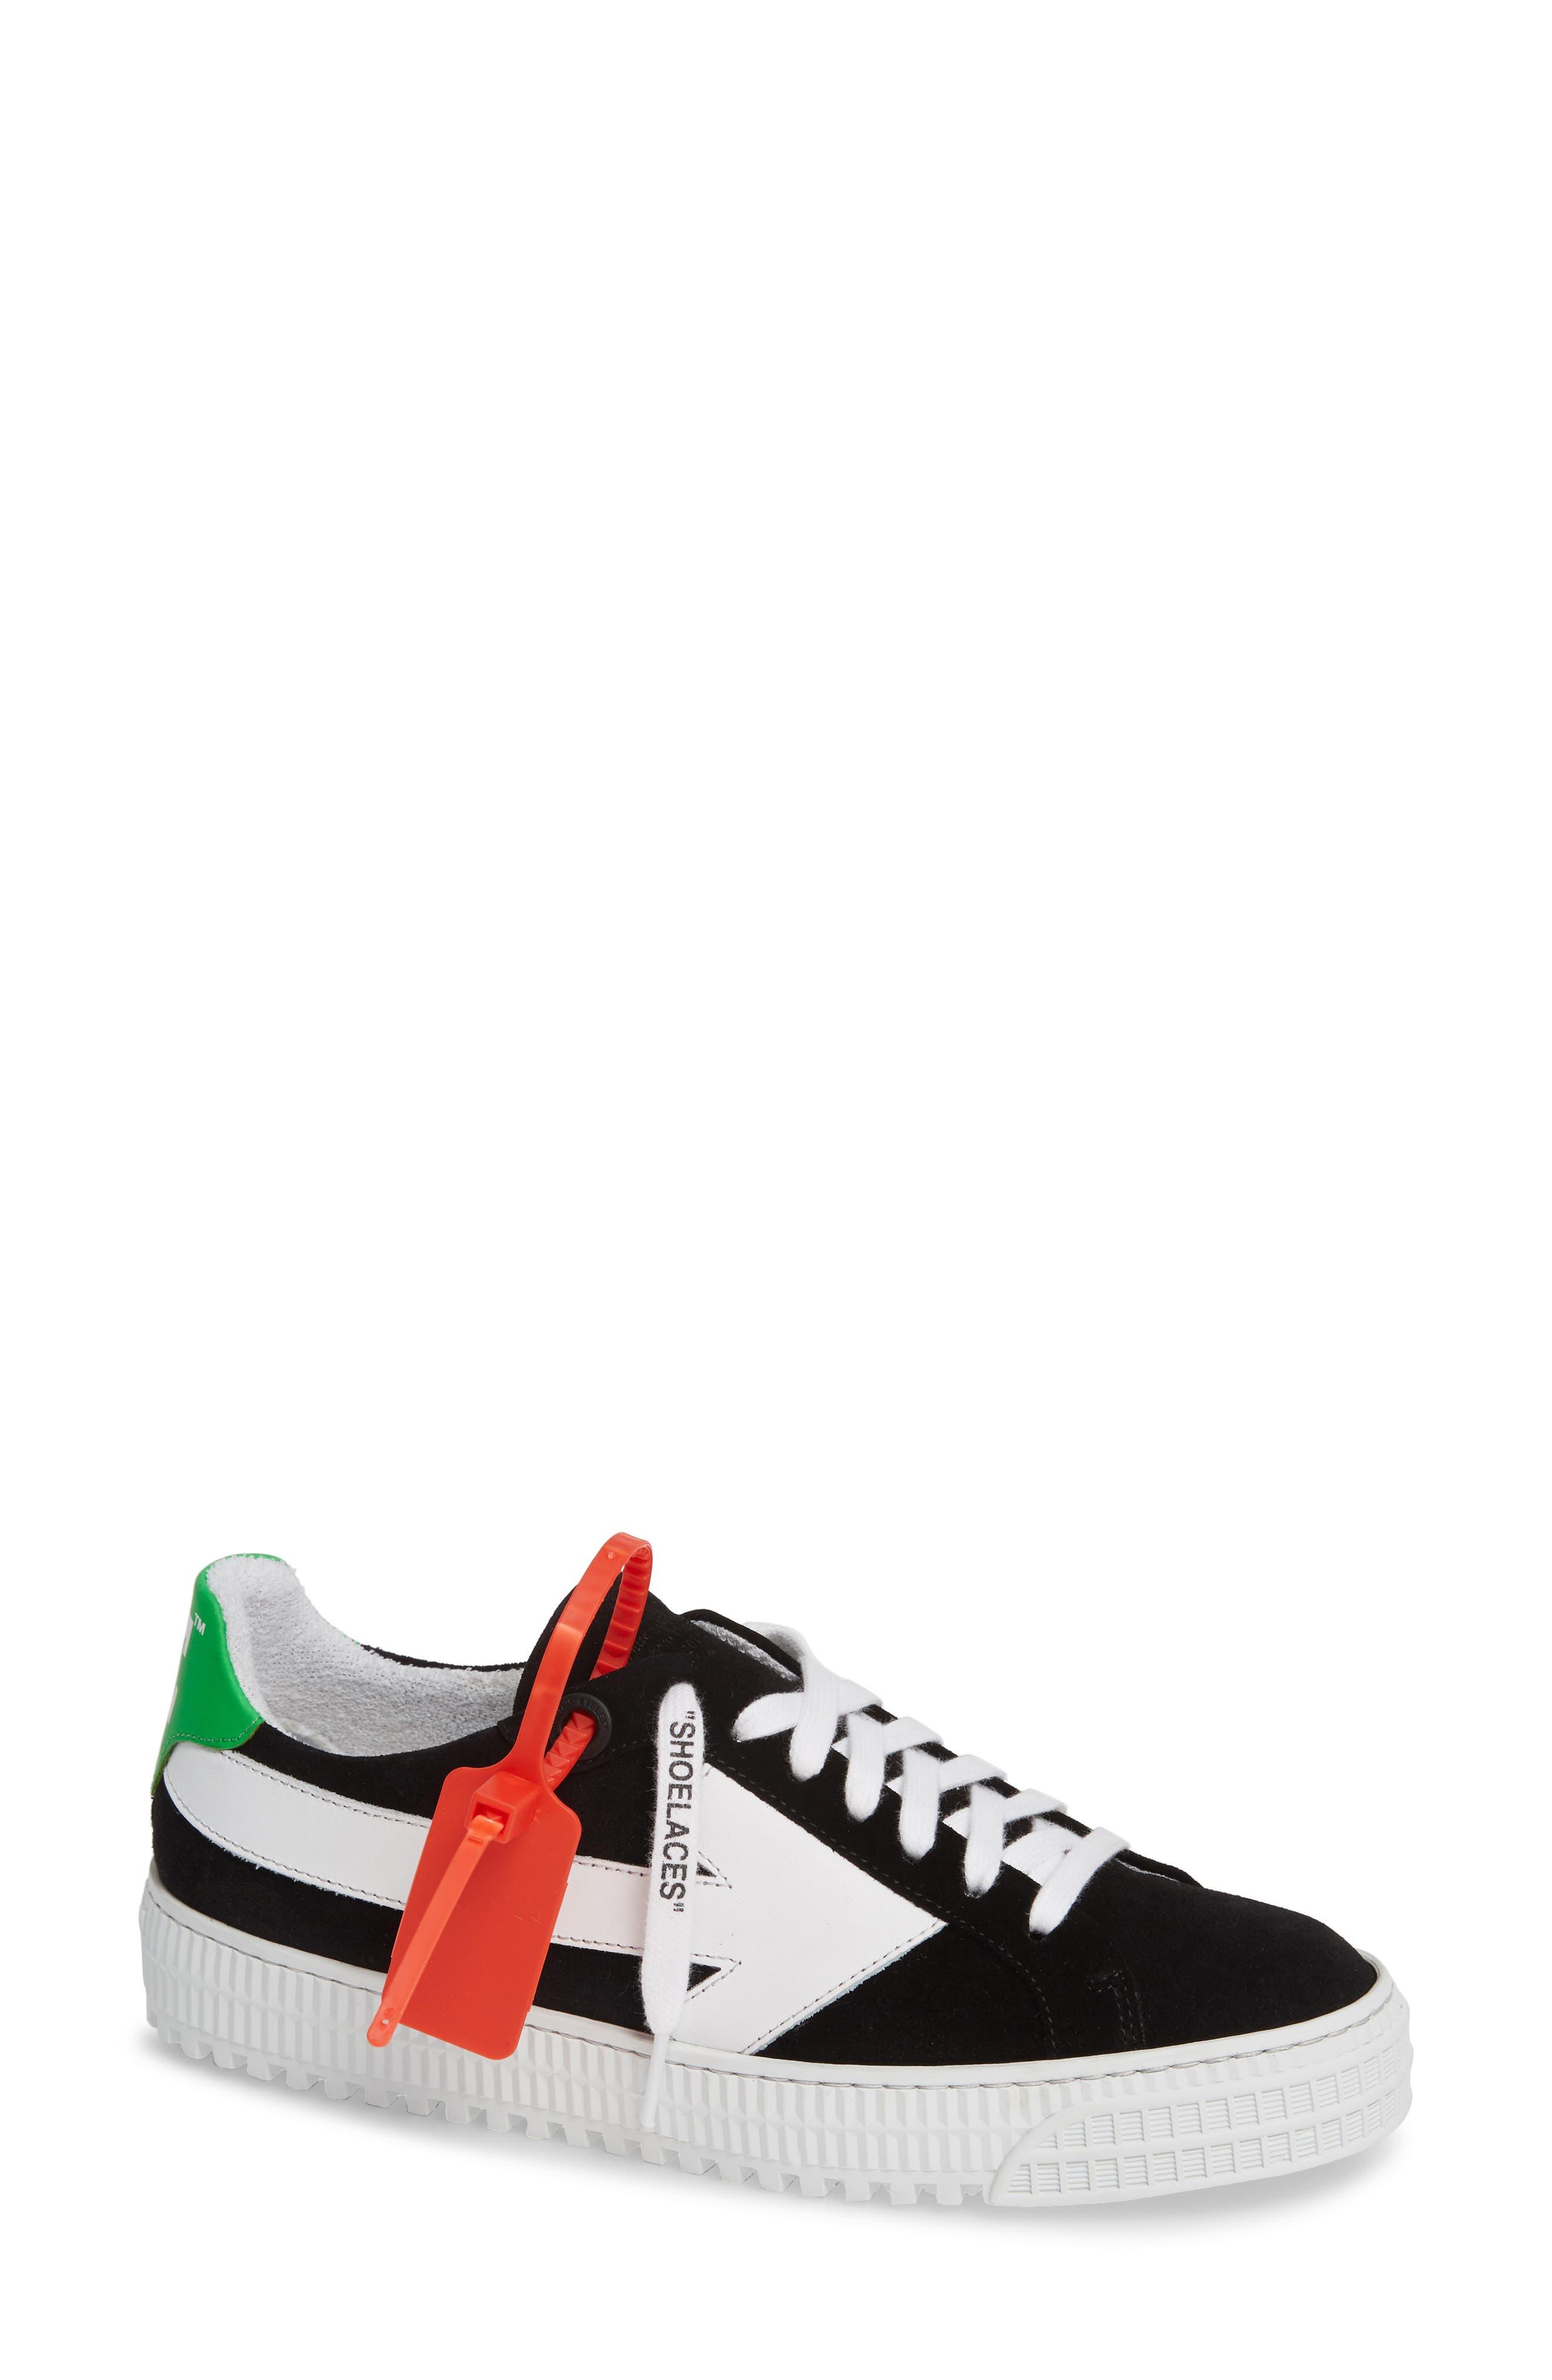 OFF-WHITE, Arrow Sneaker, Main thumbnail 1, color, BLACK WHITE